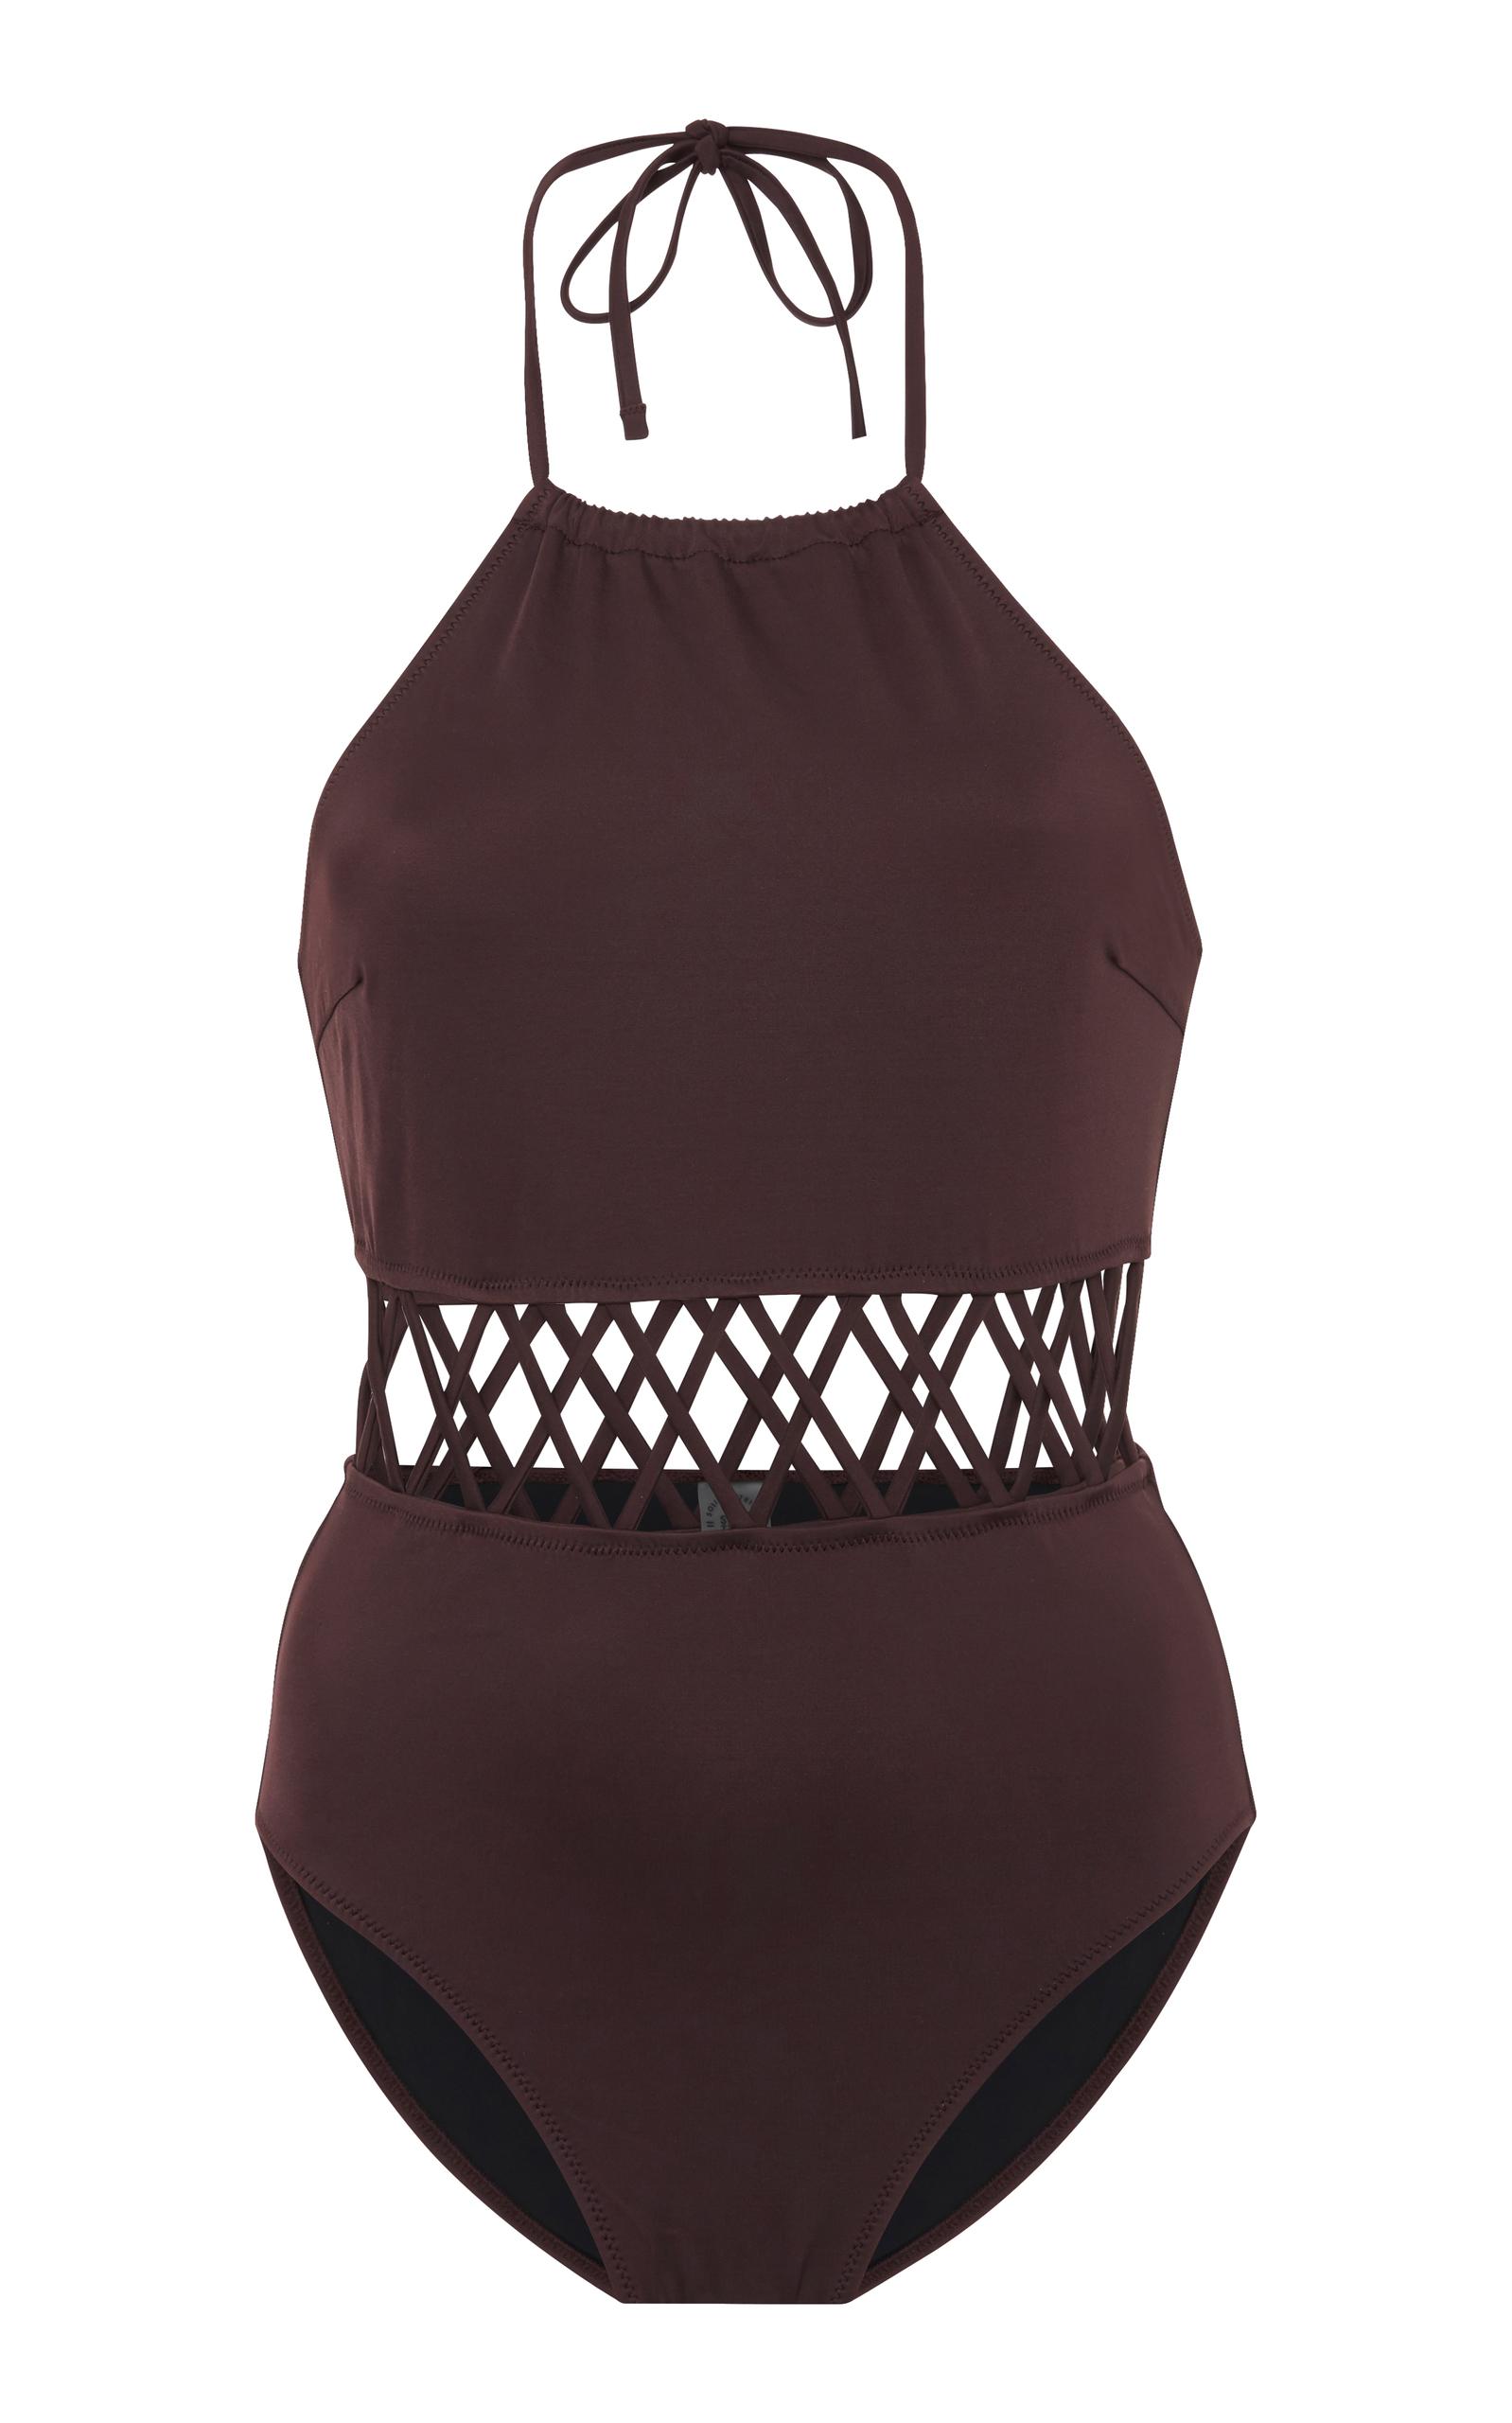 Swim Team 2018 The Barbara Lattice One-Piece Swimsuit Solid & Striped Best Store To Get Sale Online yu2YK